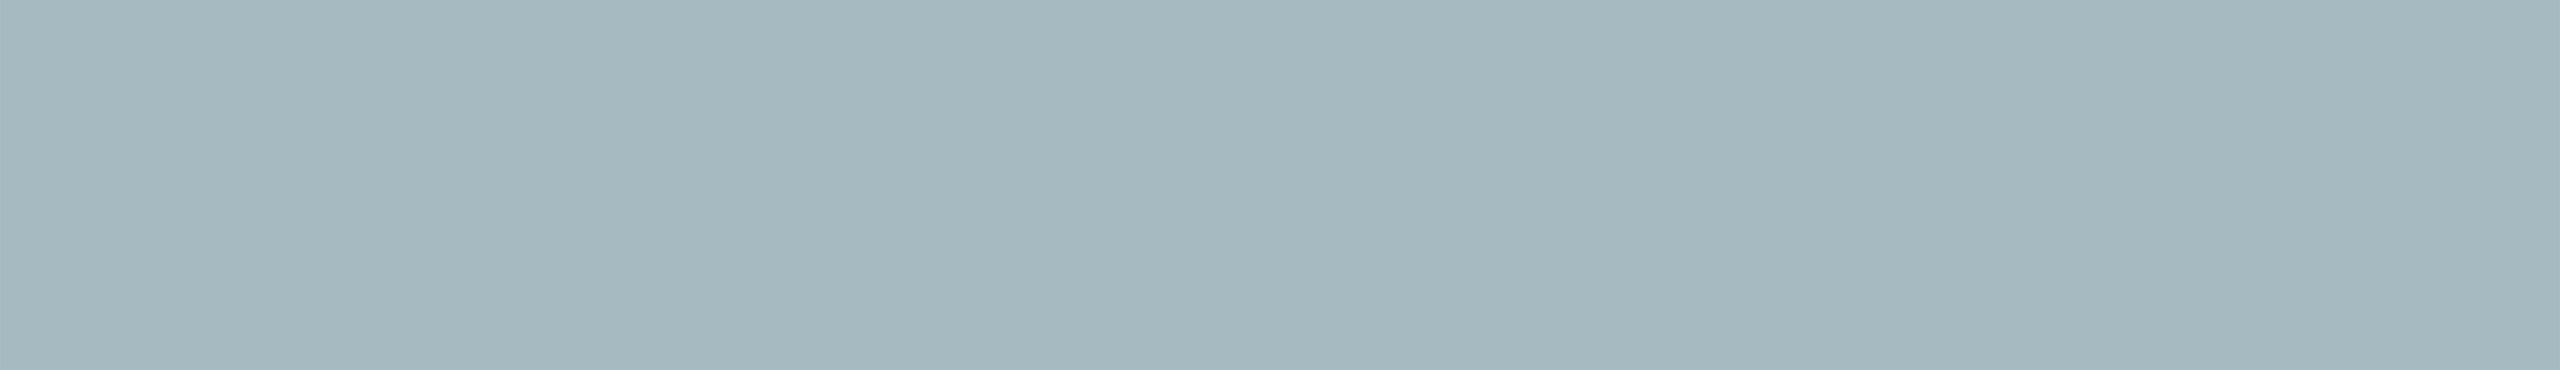 schuh koch farbtrenner: standard